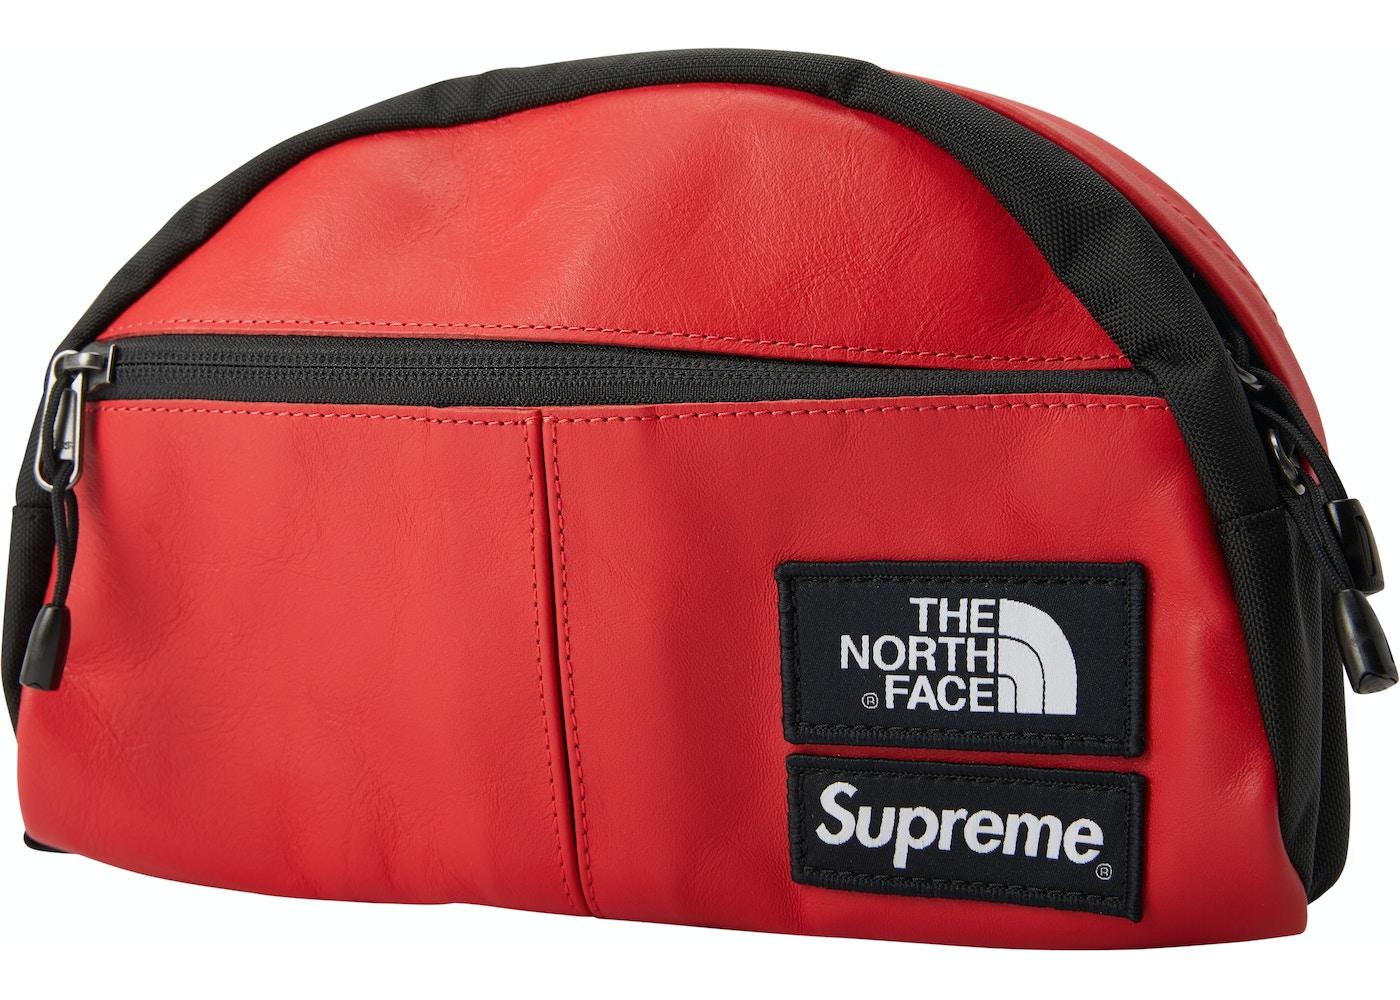 7c02a09d1 Streetwear - Supreme Bags - Volatility